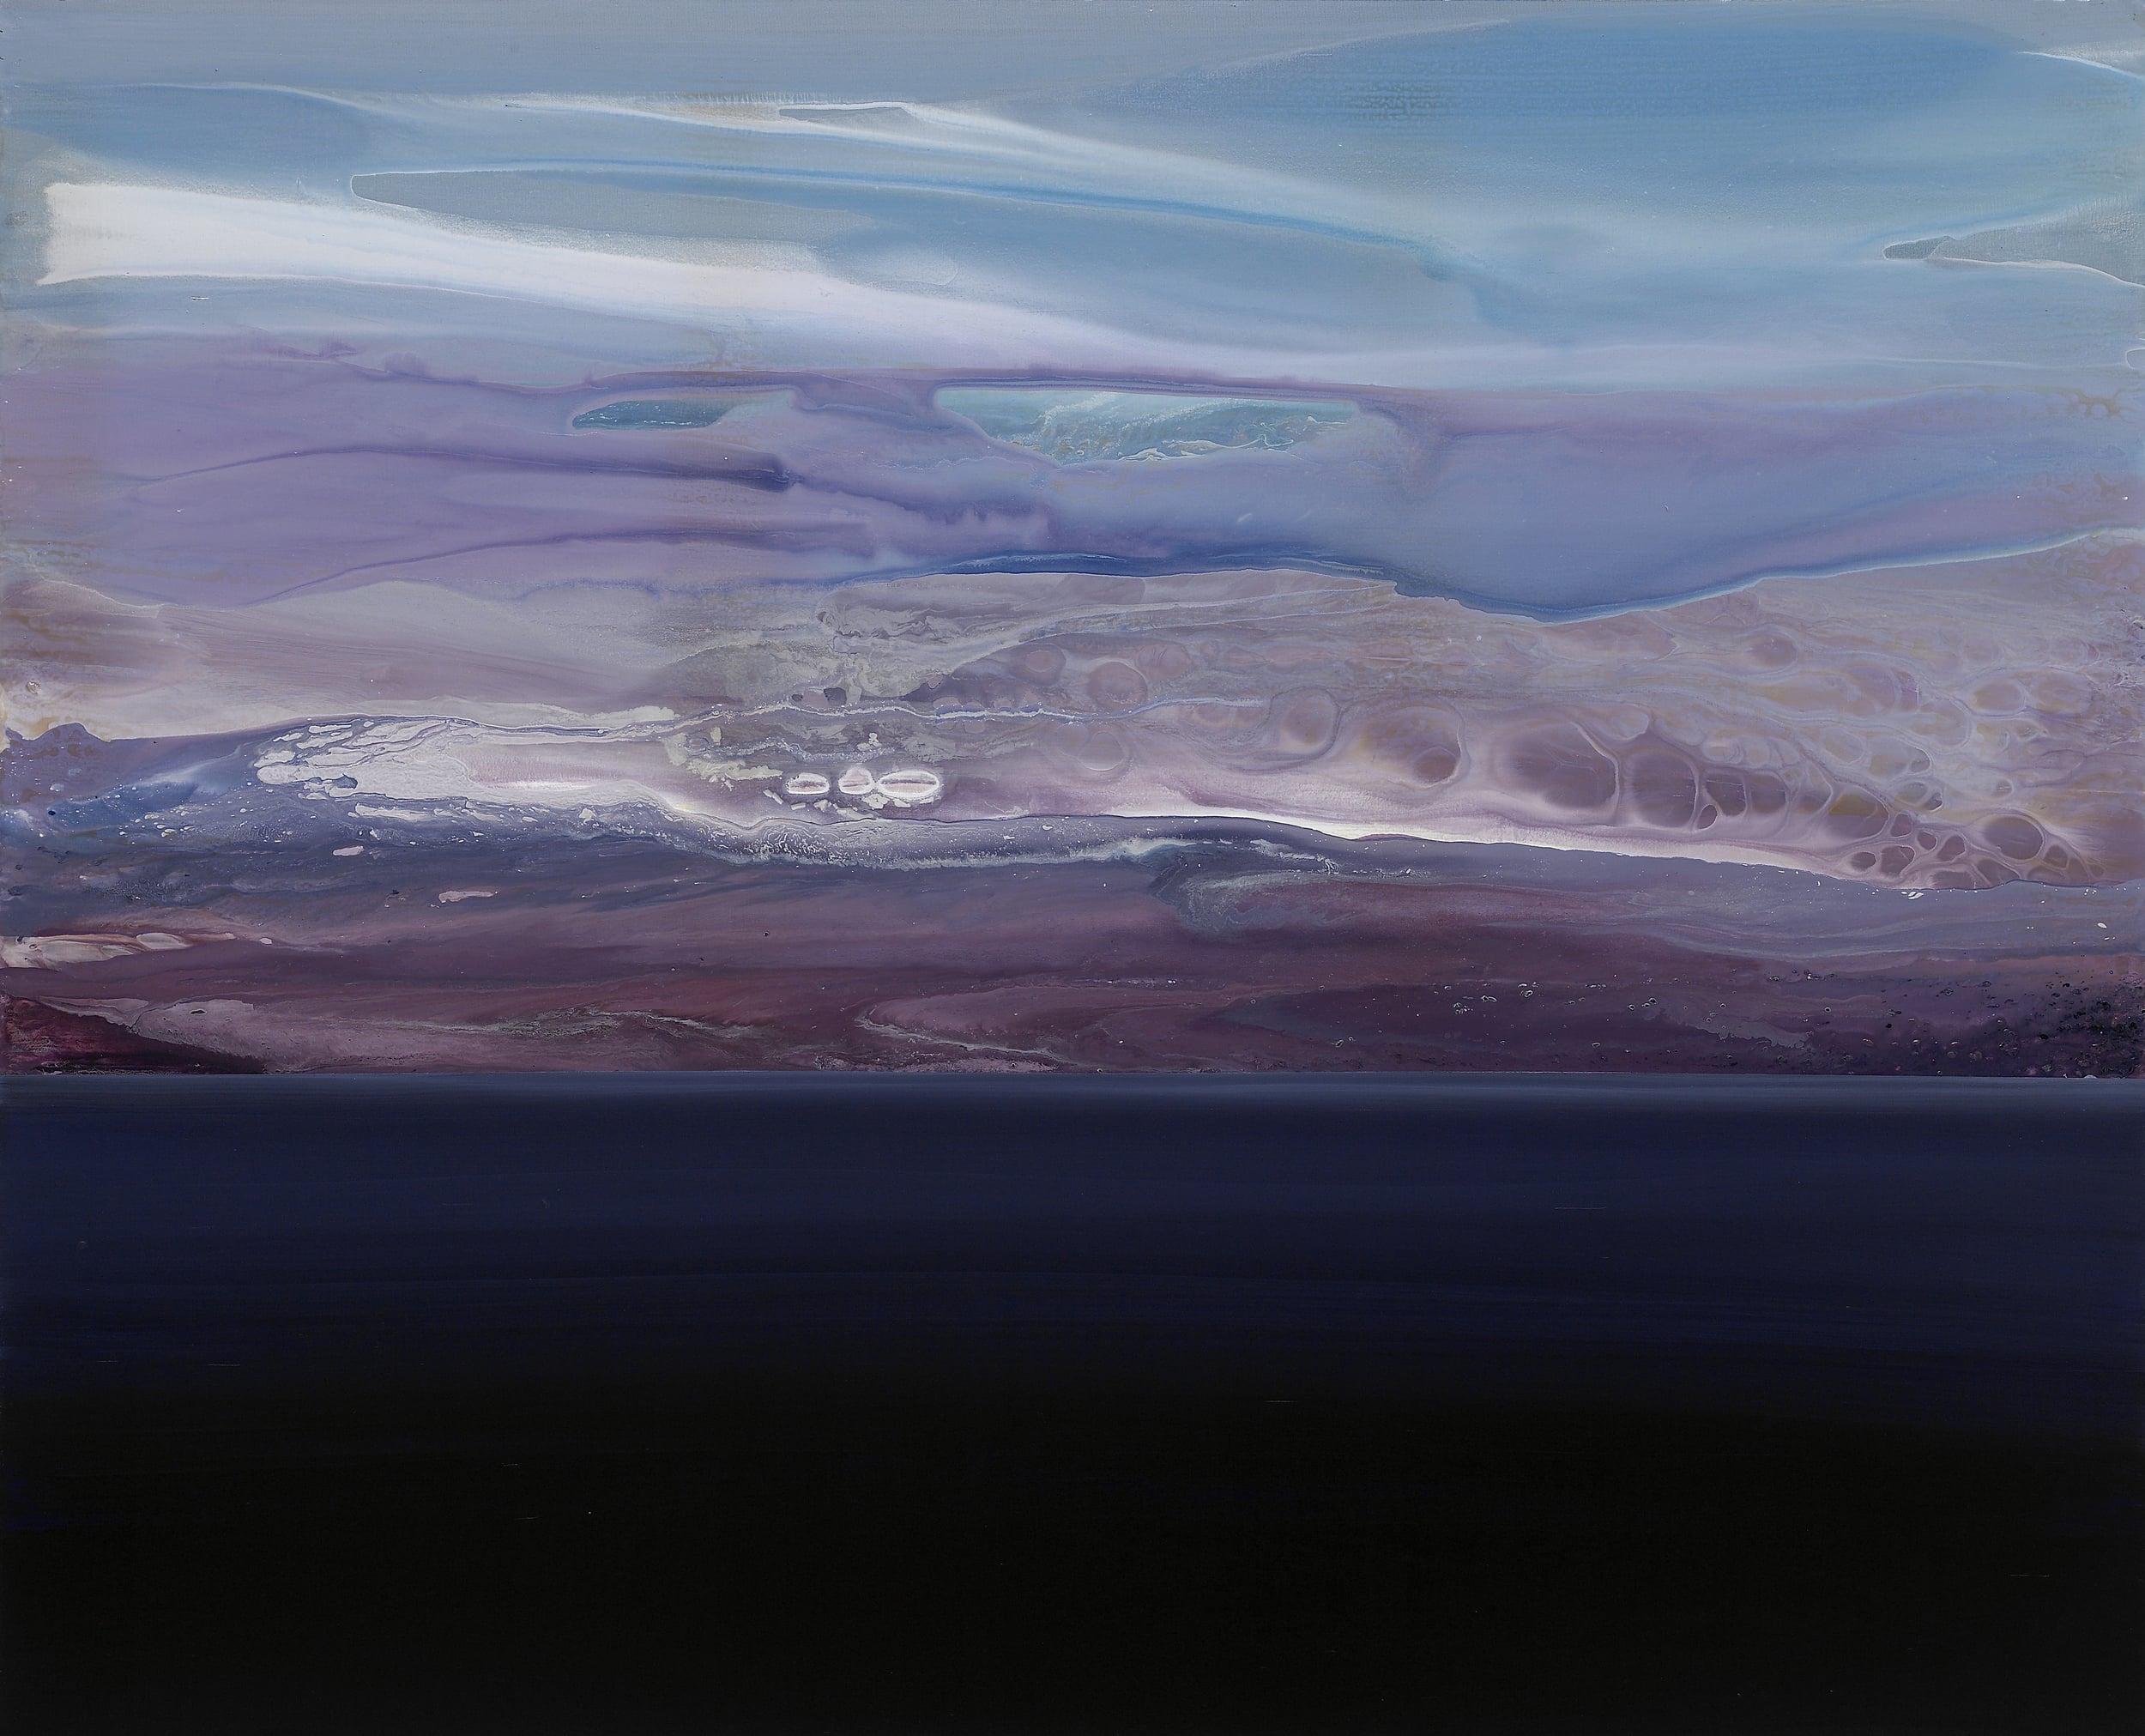 horizon_03  acrylic on canvas  162 cm X 130 cm  2013